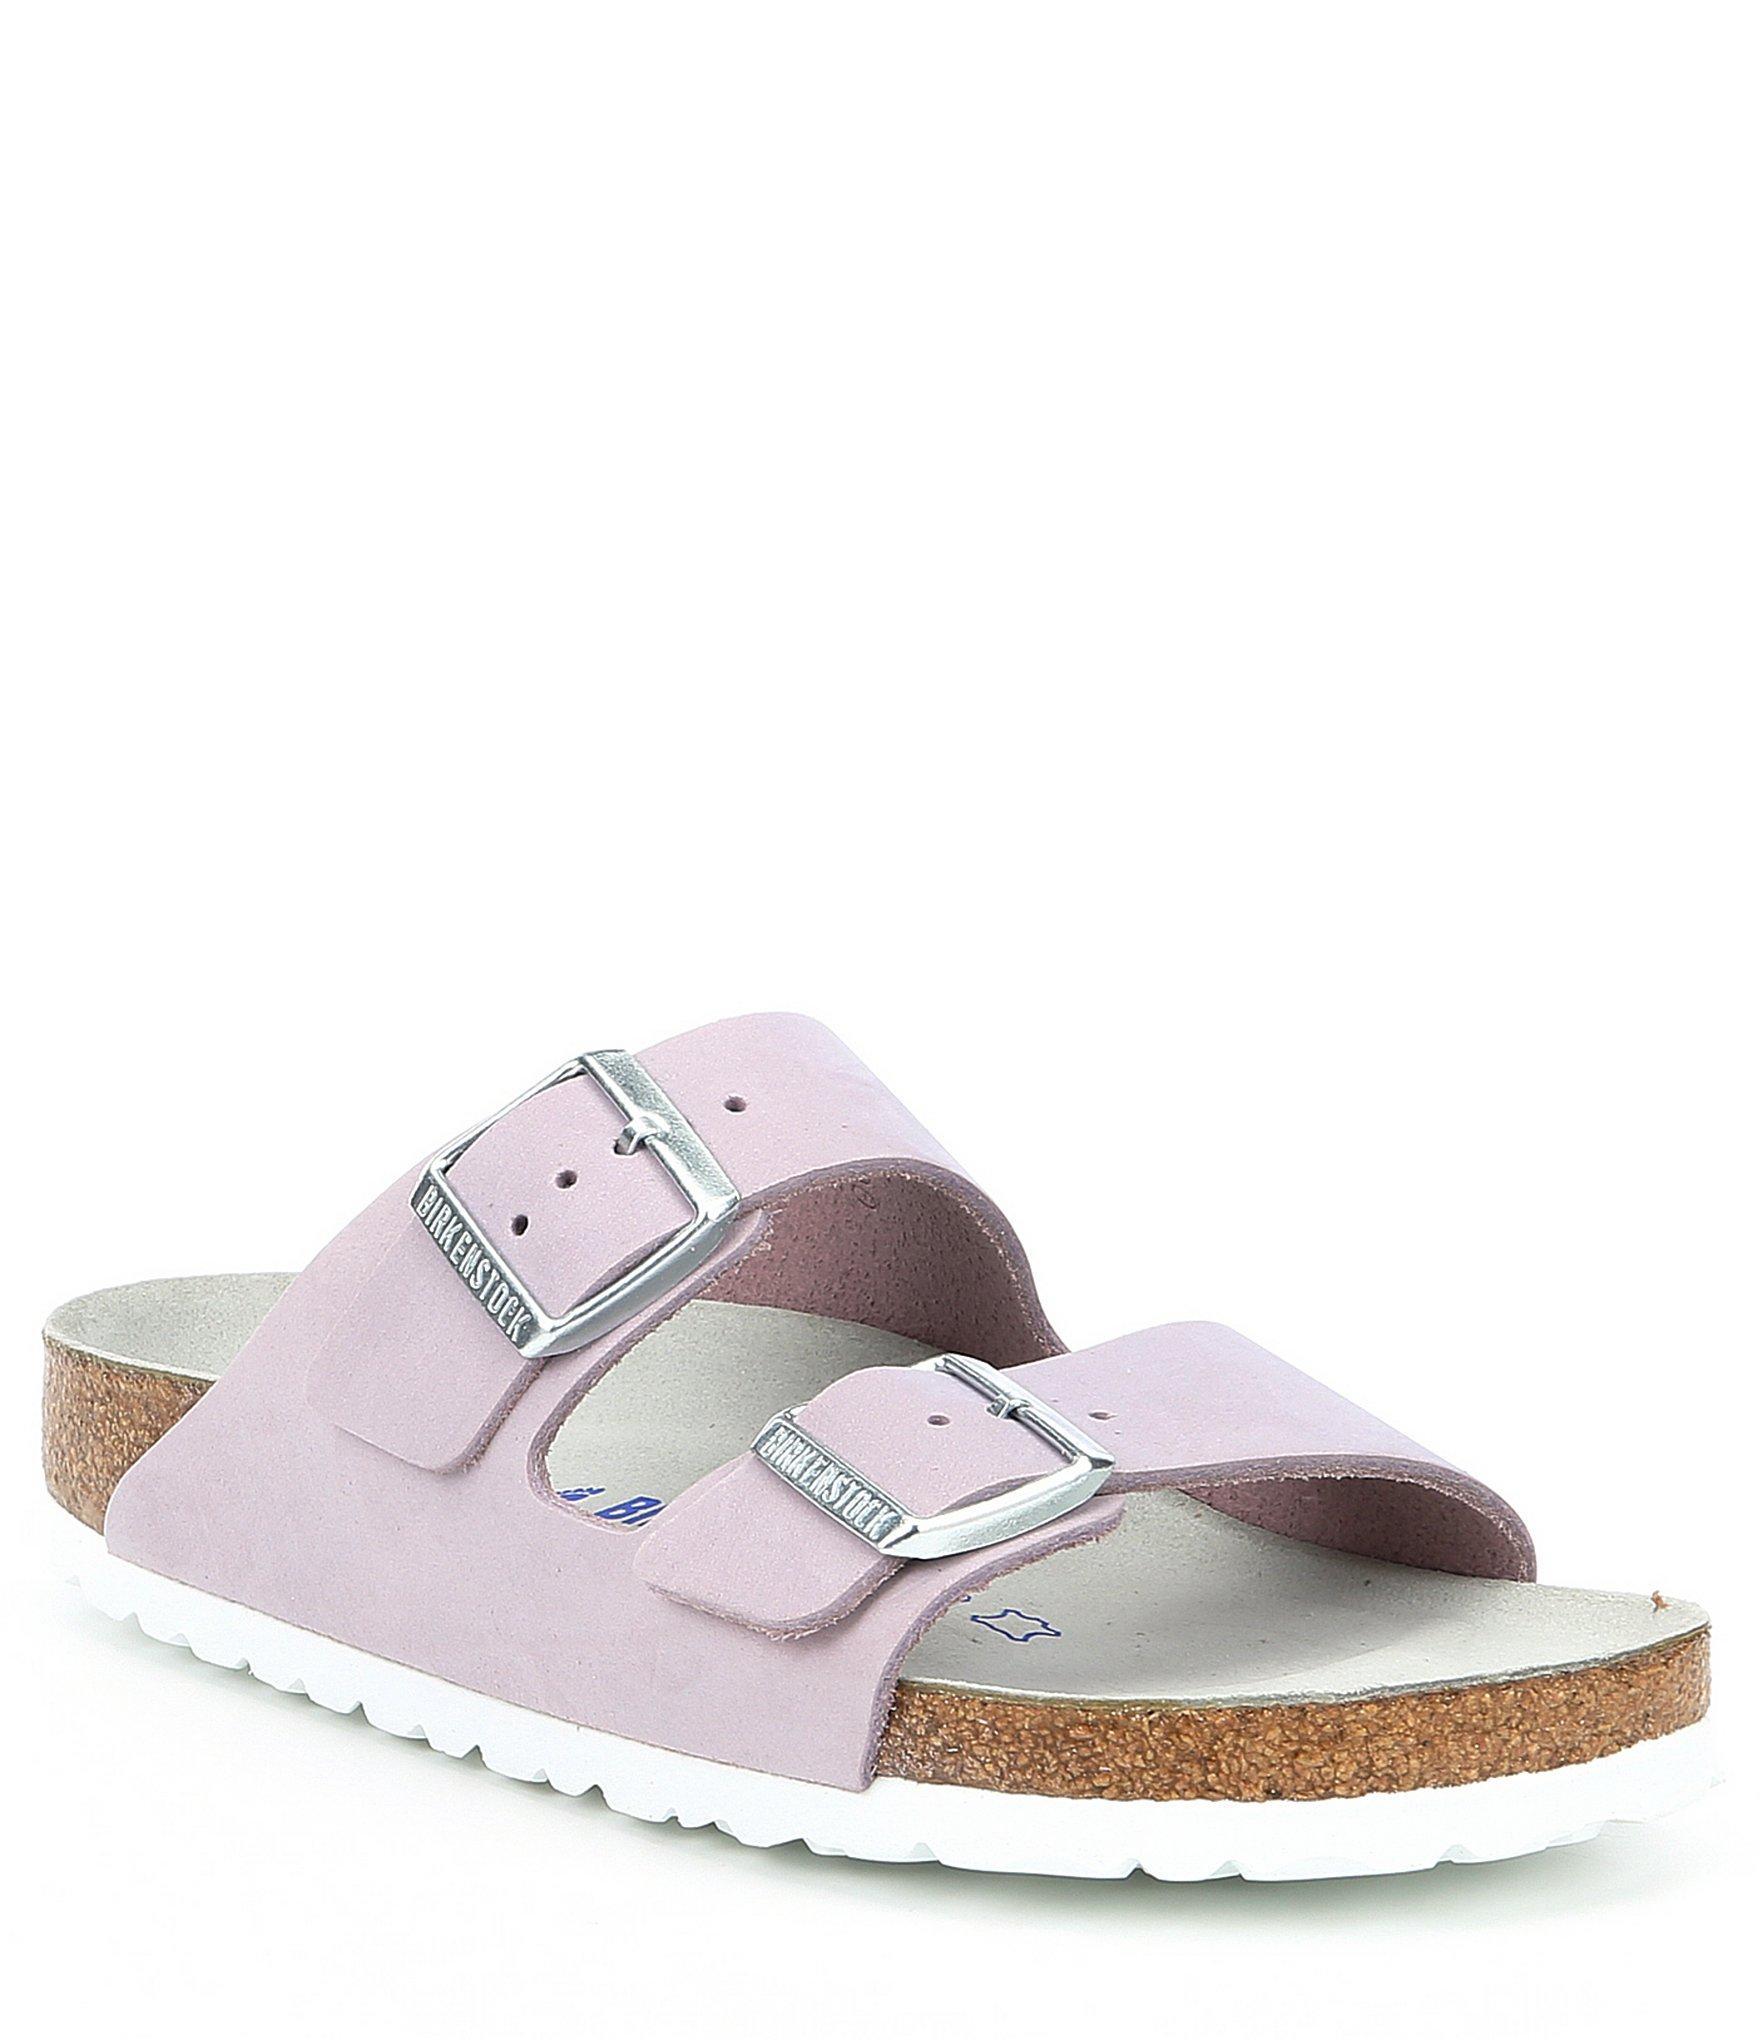 4609613eb986 Birkenstock - Purple Women s Arizona Soft Footbed Nubuck Sandals - Lyst.  View fullscreen